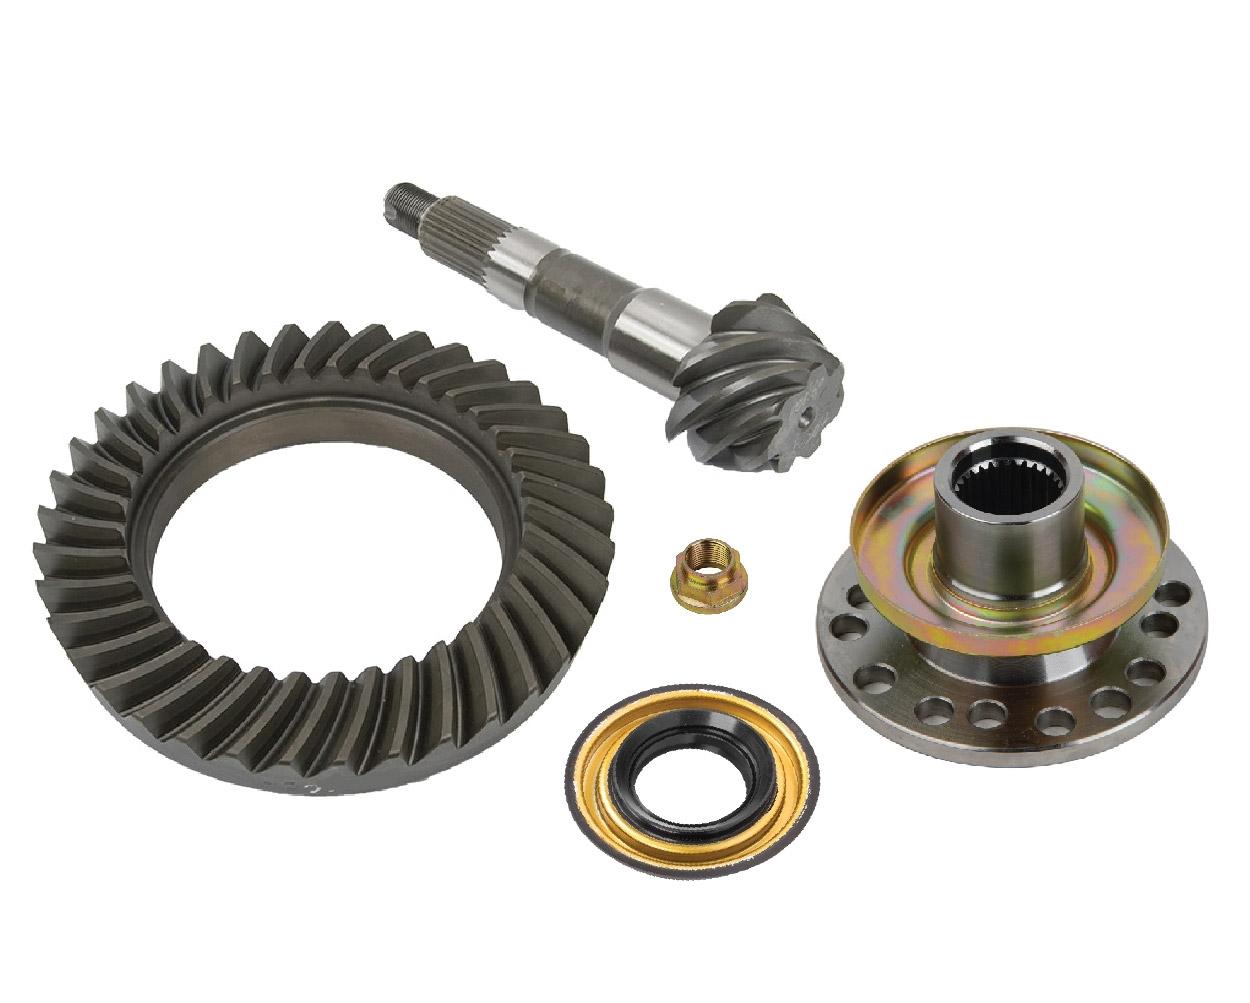 Gear Box Pinion : Trail creeper™ spline ring pinion gears w flange kit